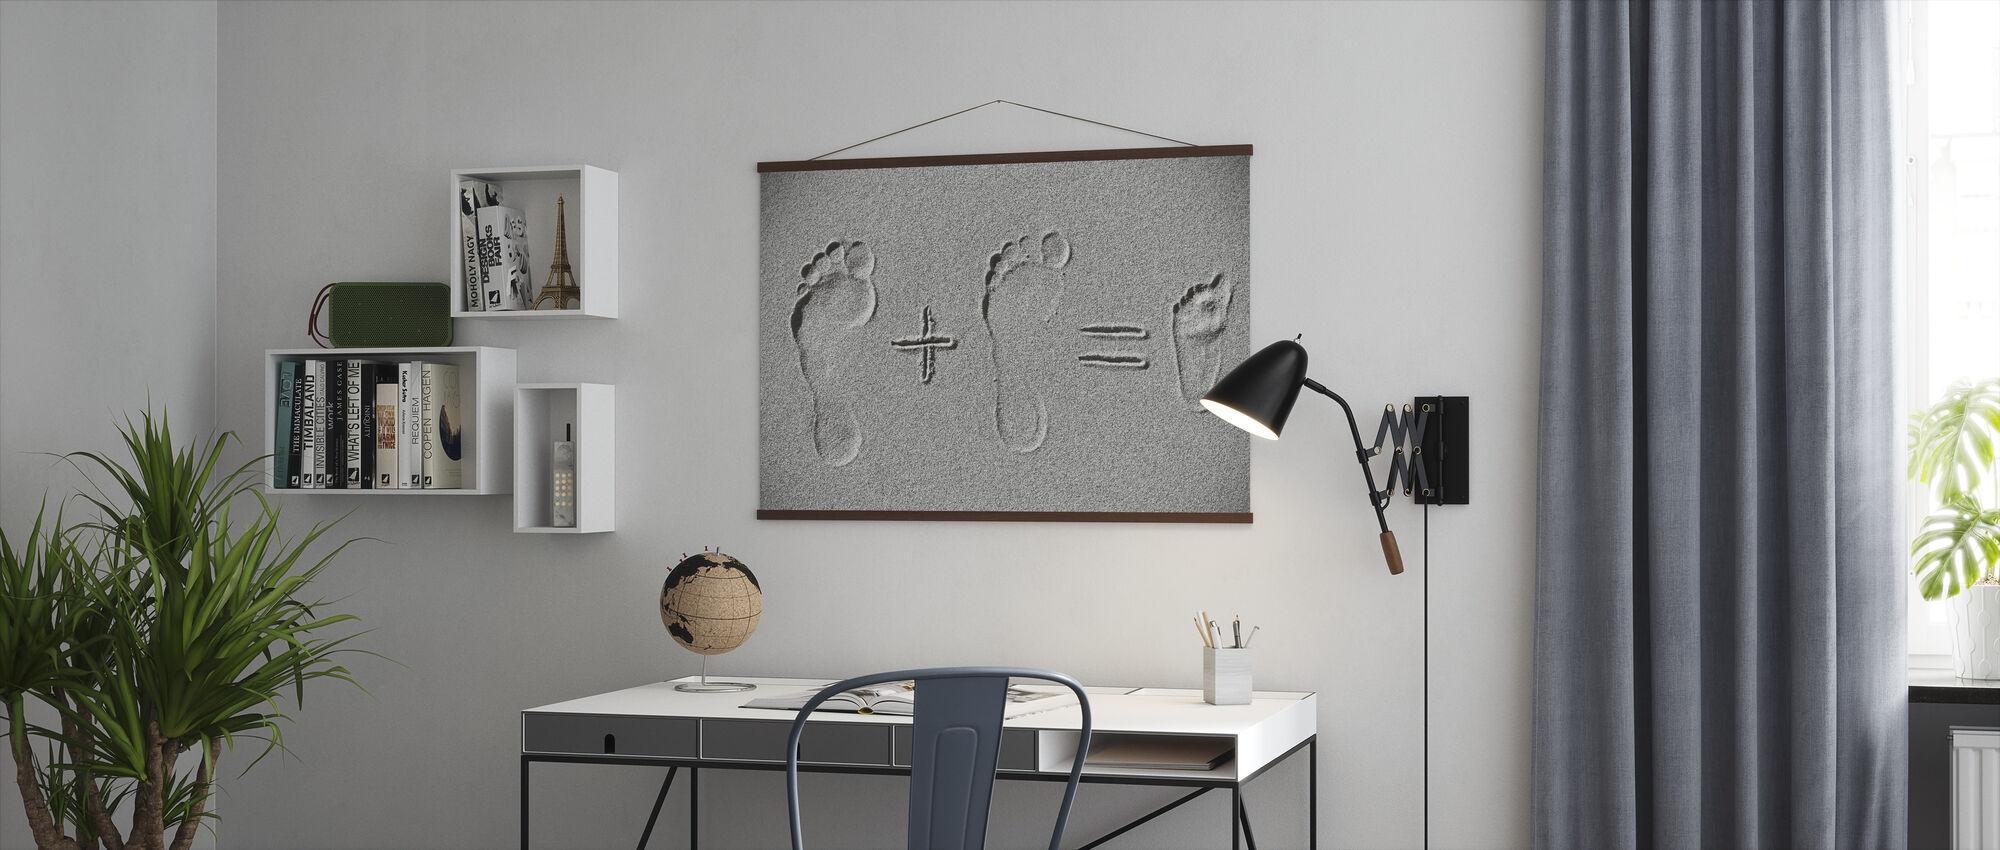 Sand aritmetik - Poster - Kontor